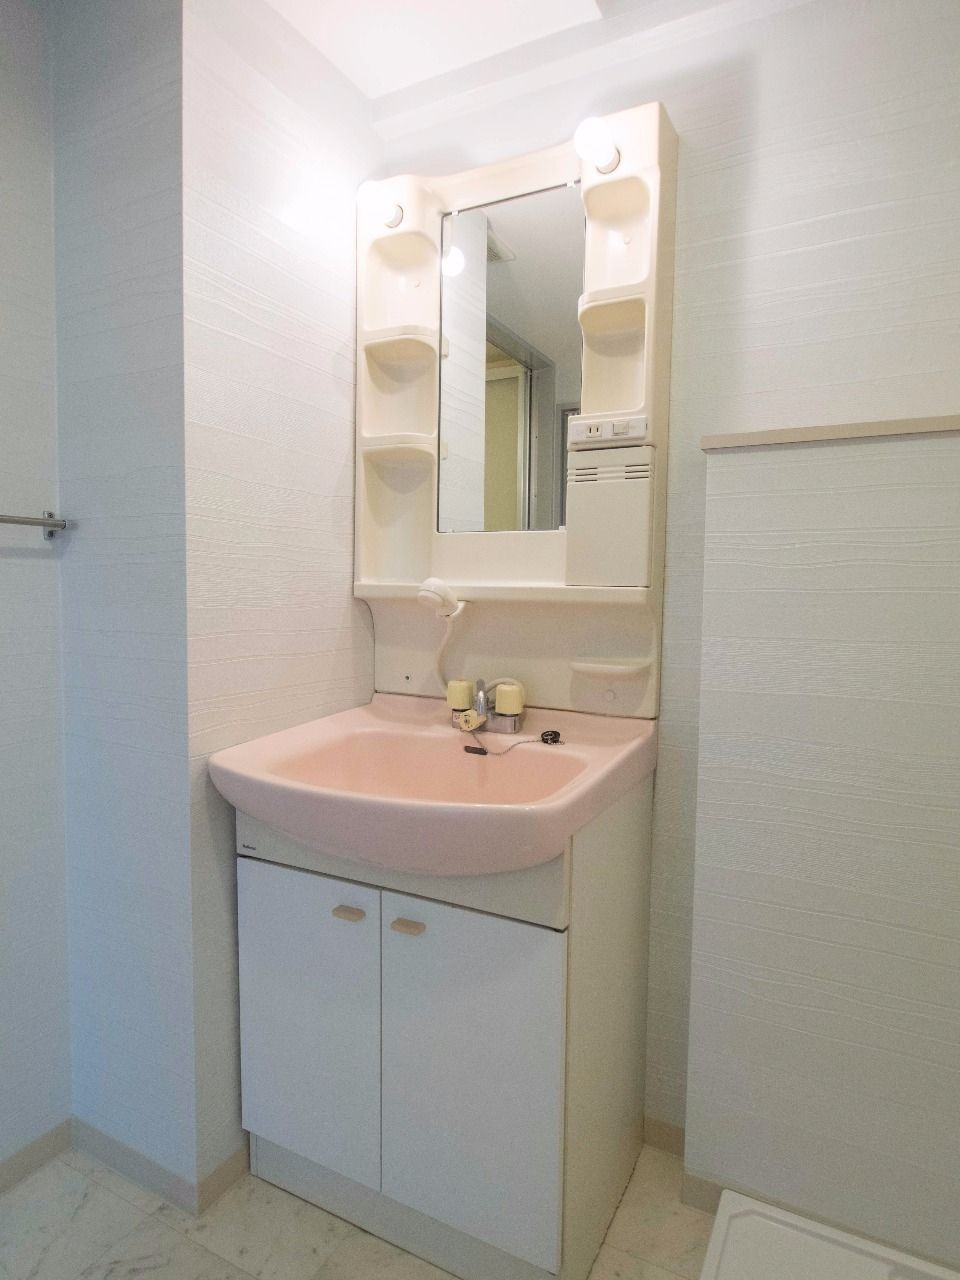 シャワー水栓付洗面台